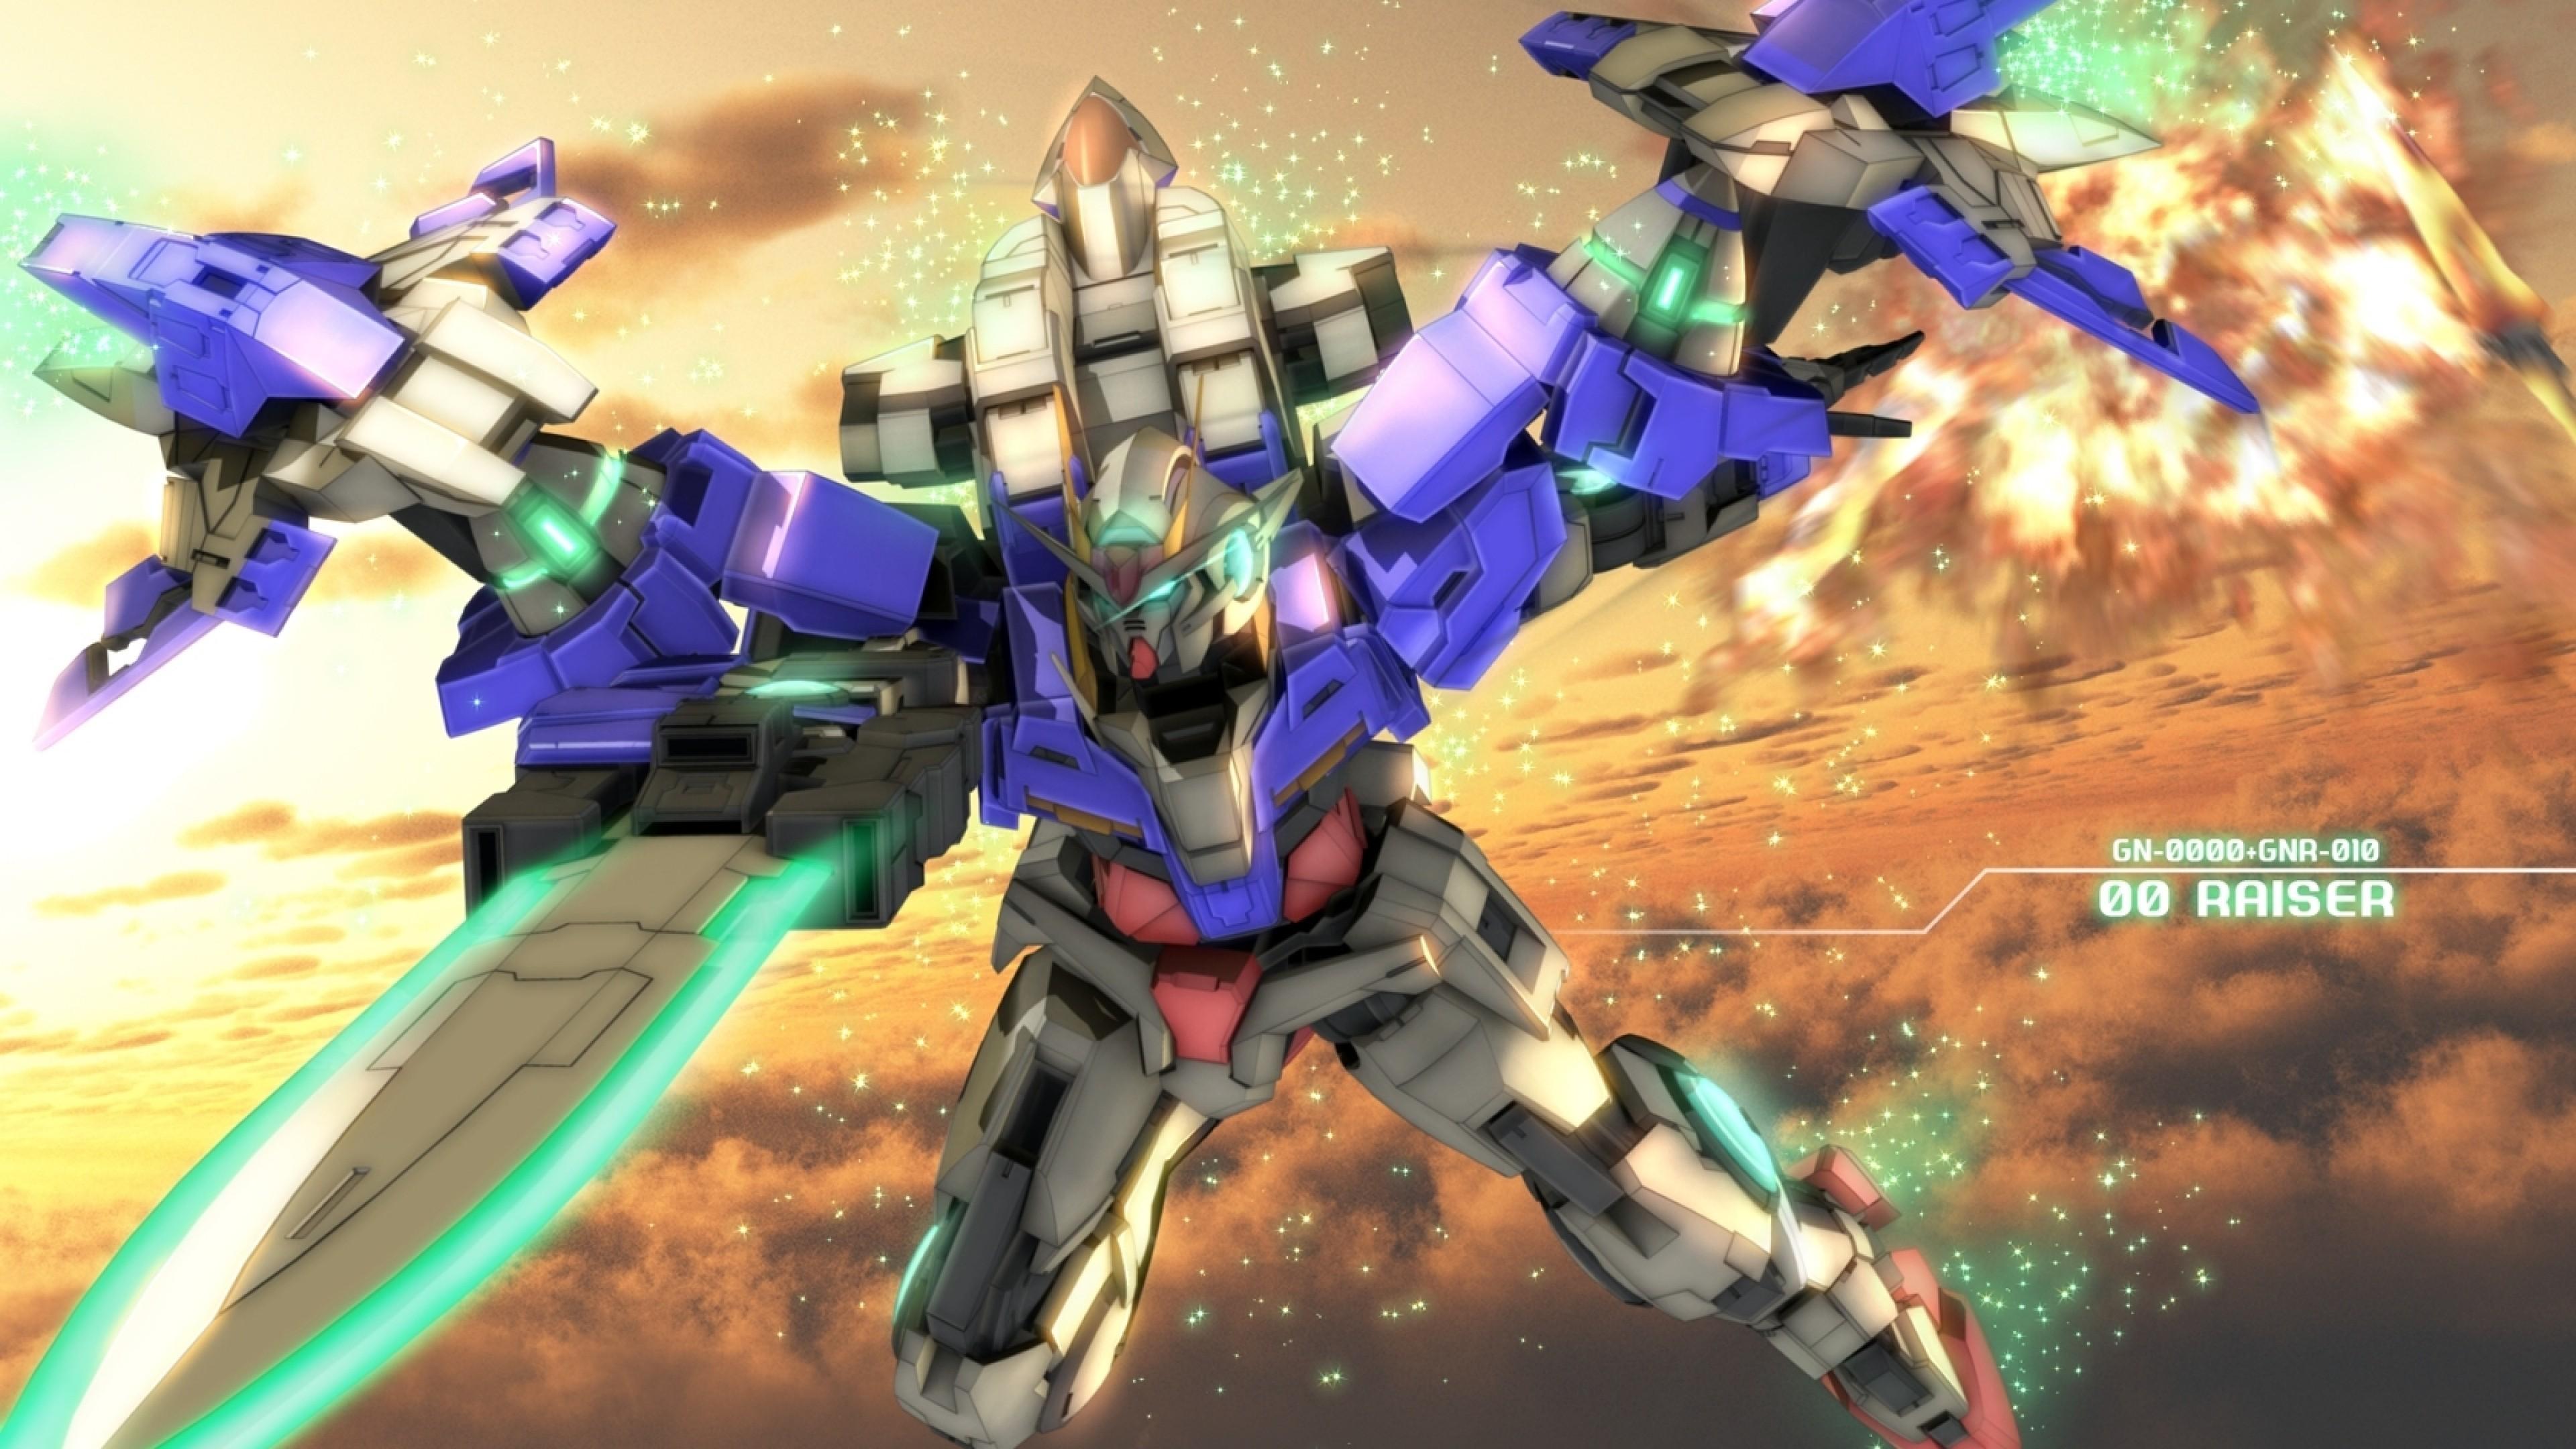 Gundam 00 Raiser Wallpaper 59 Pictures